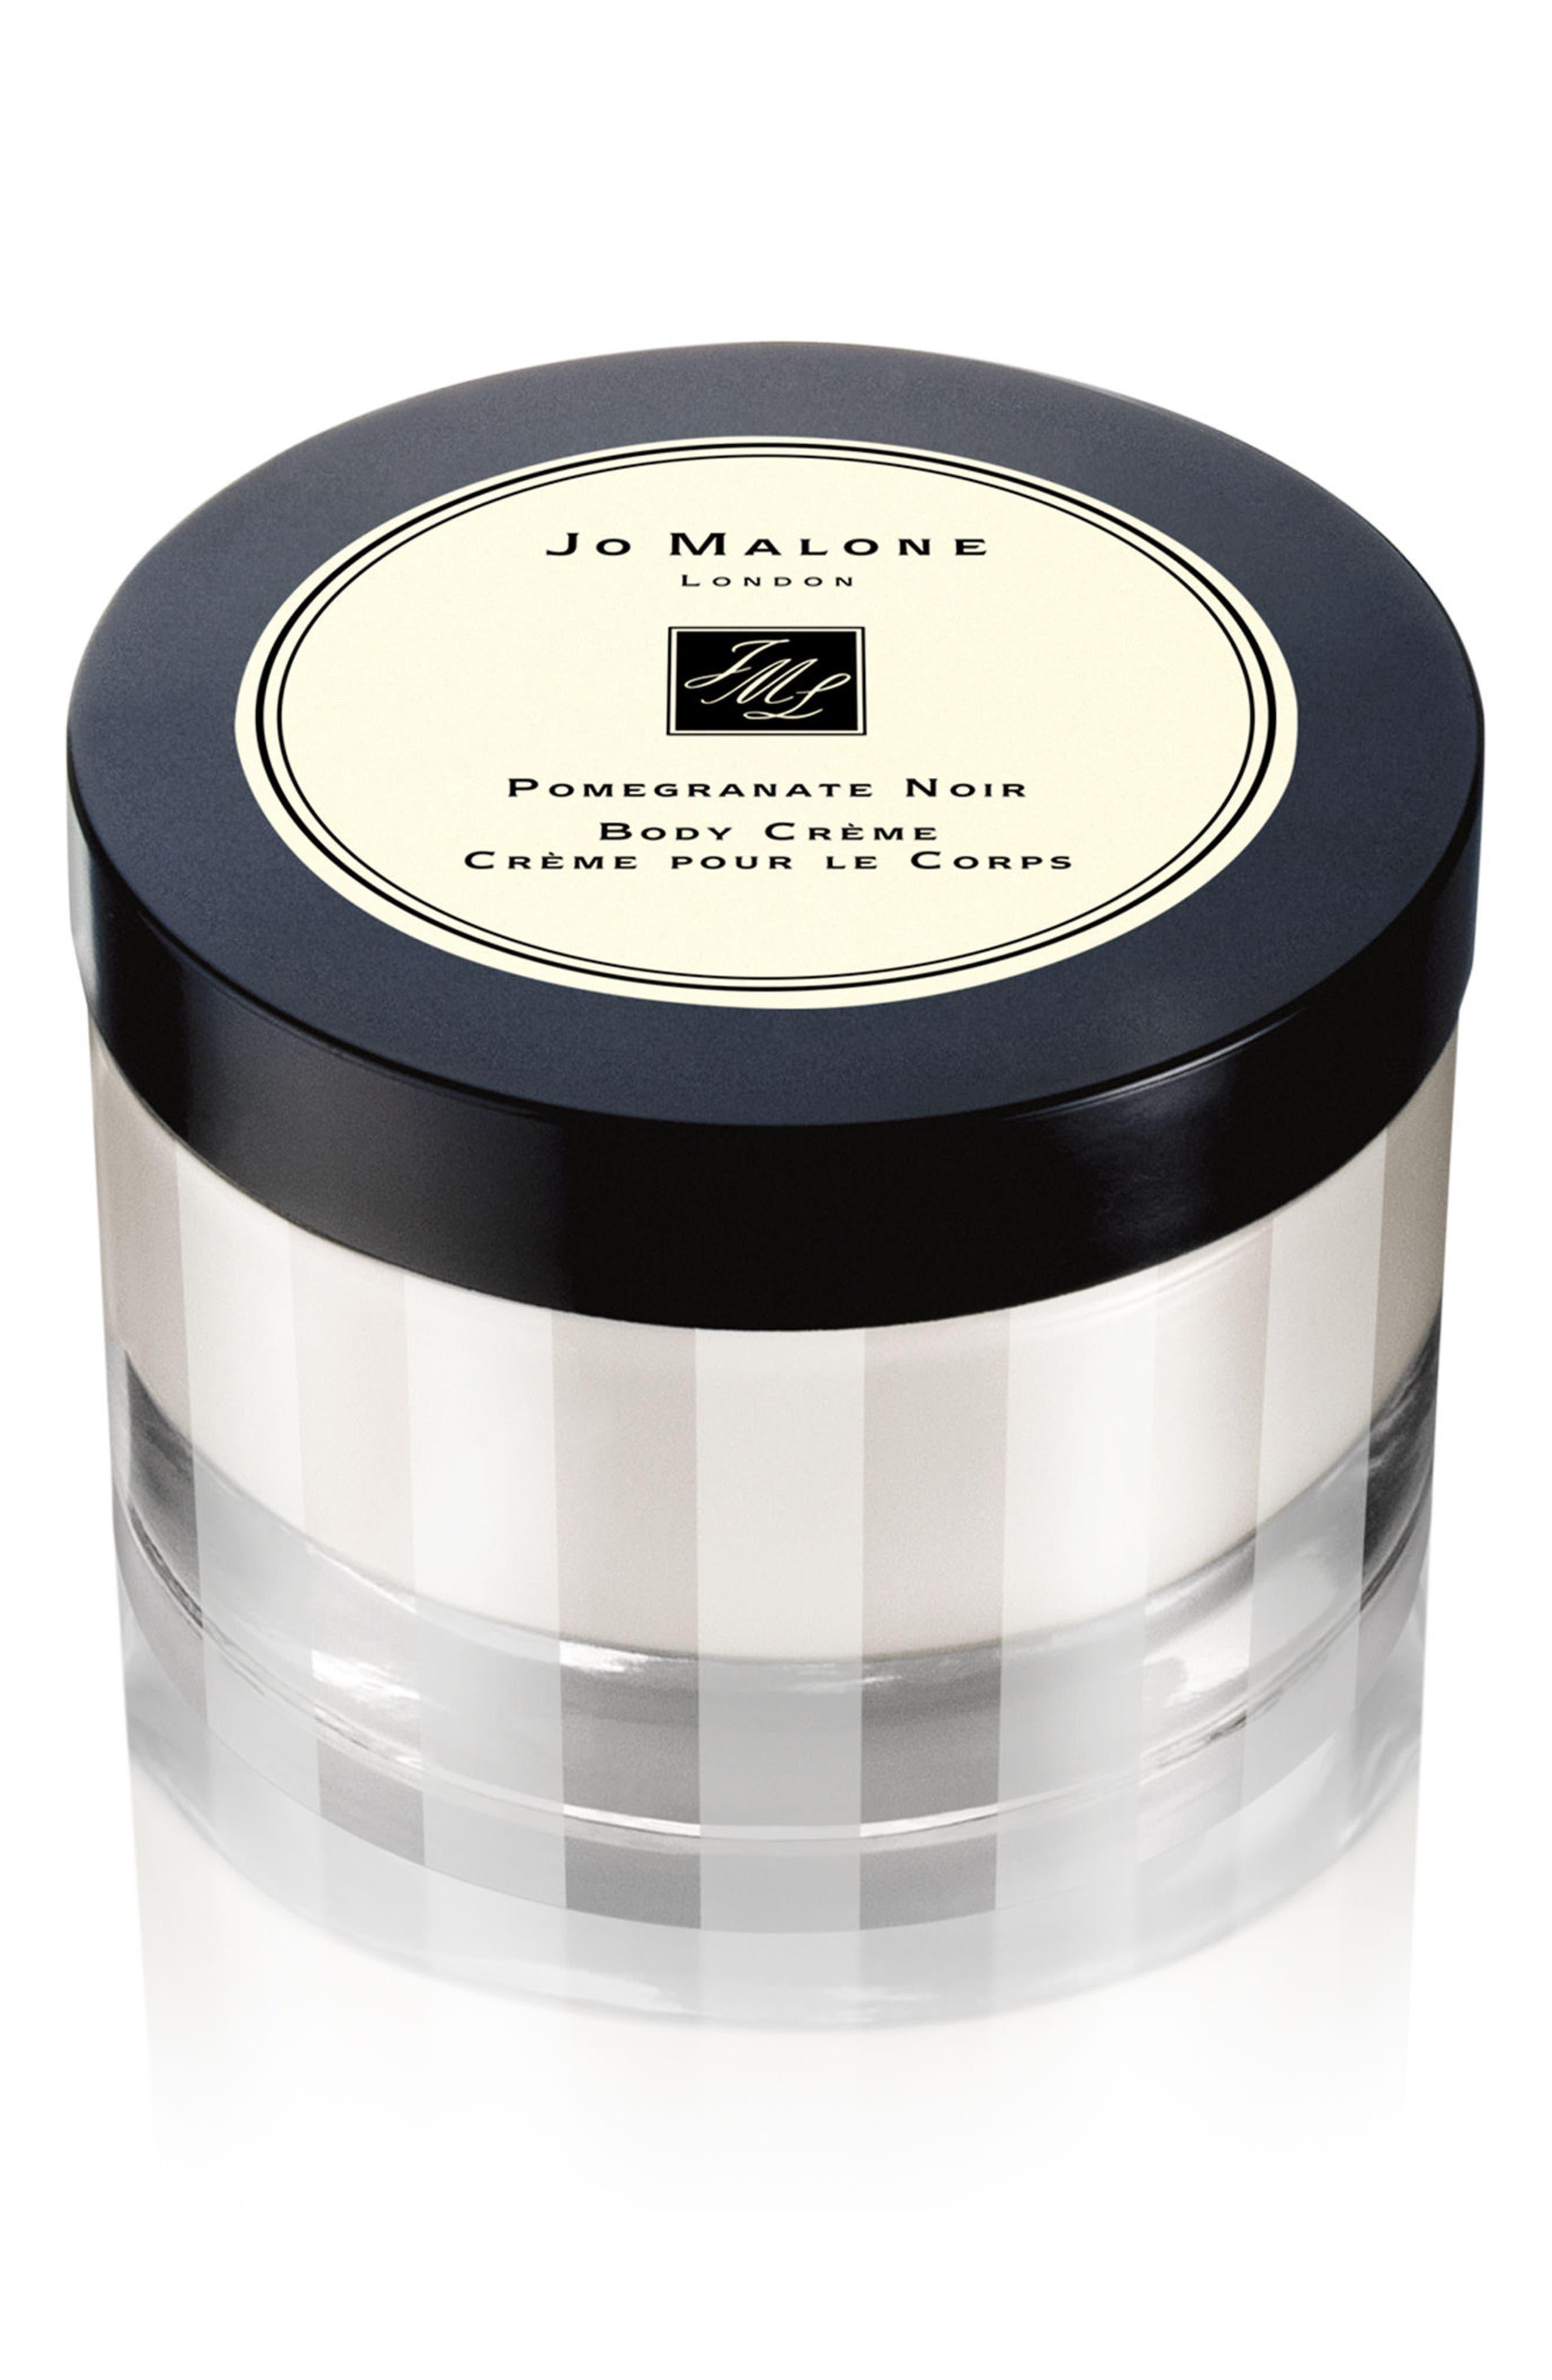 Main Image - Jo Malone London™ Pomegranate Noir Body Crème